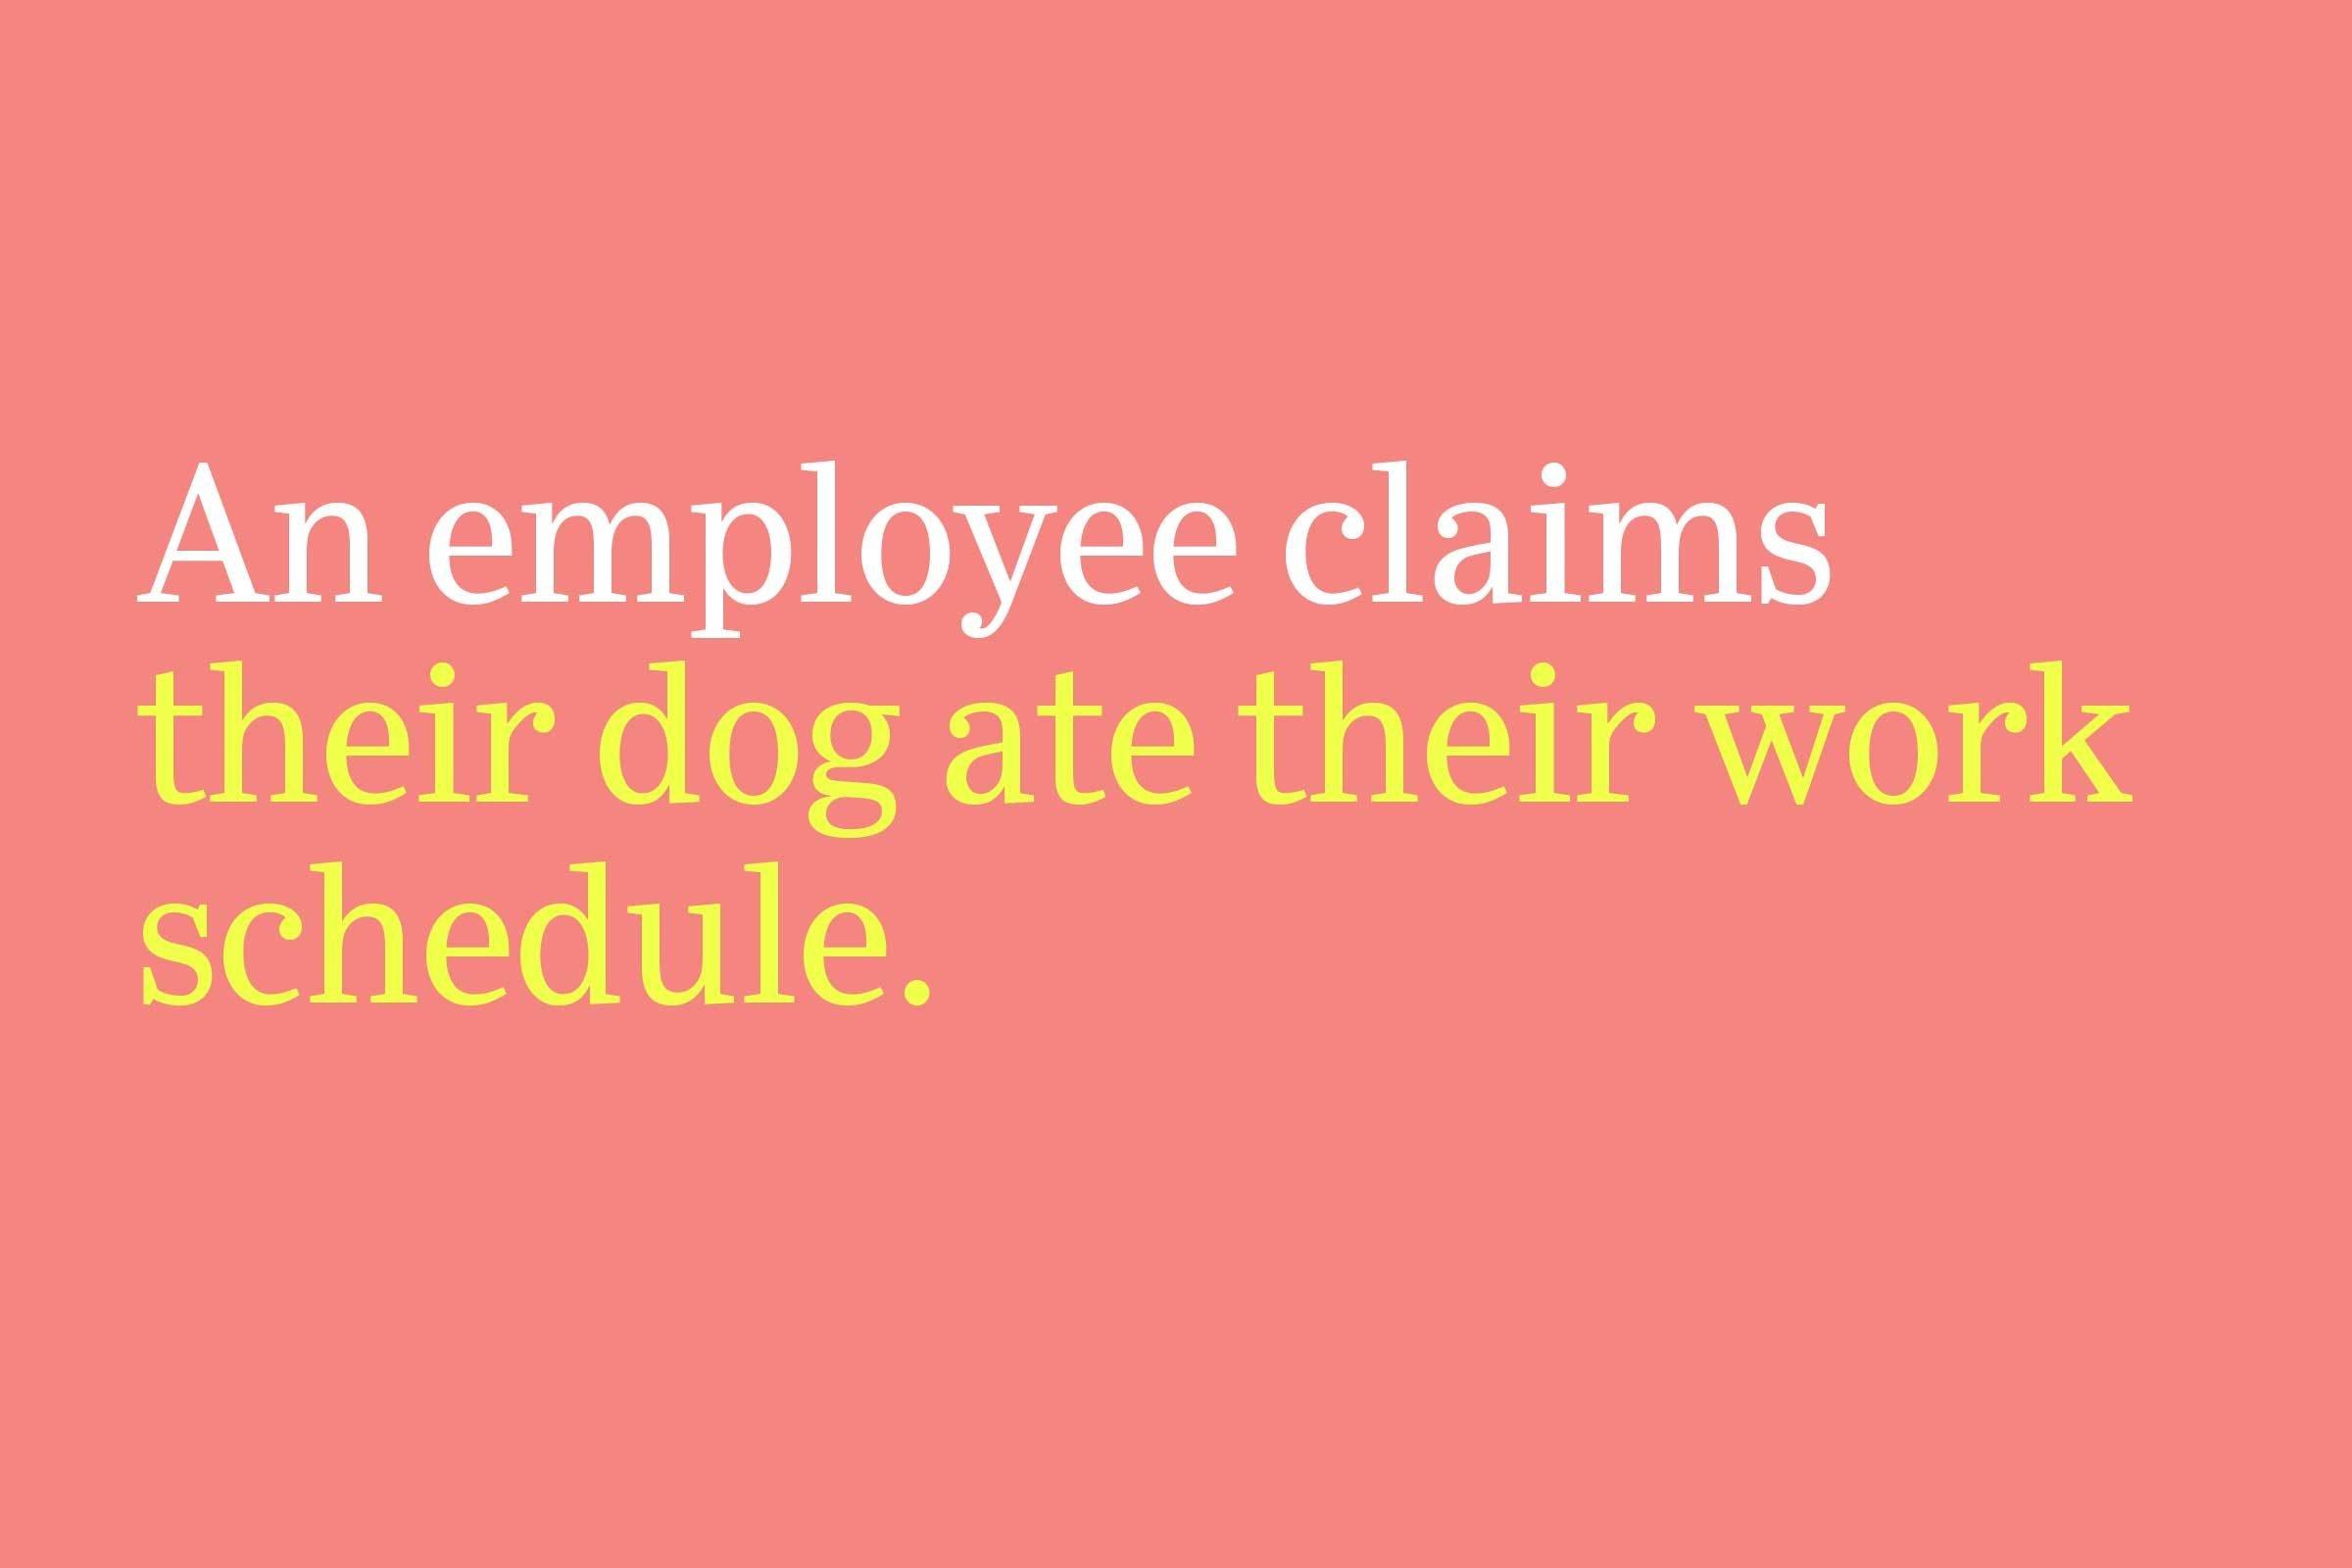 their dog ate their work schedule